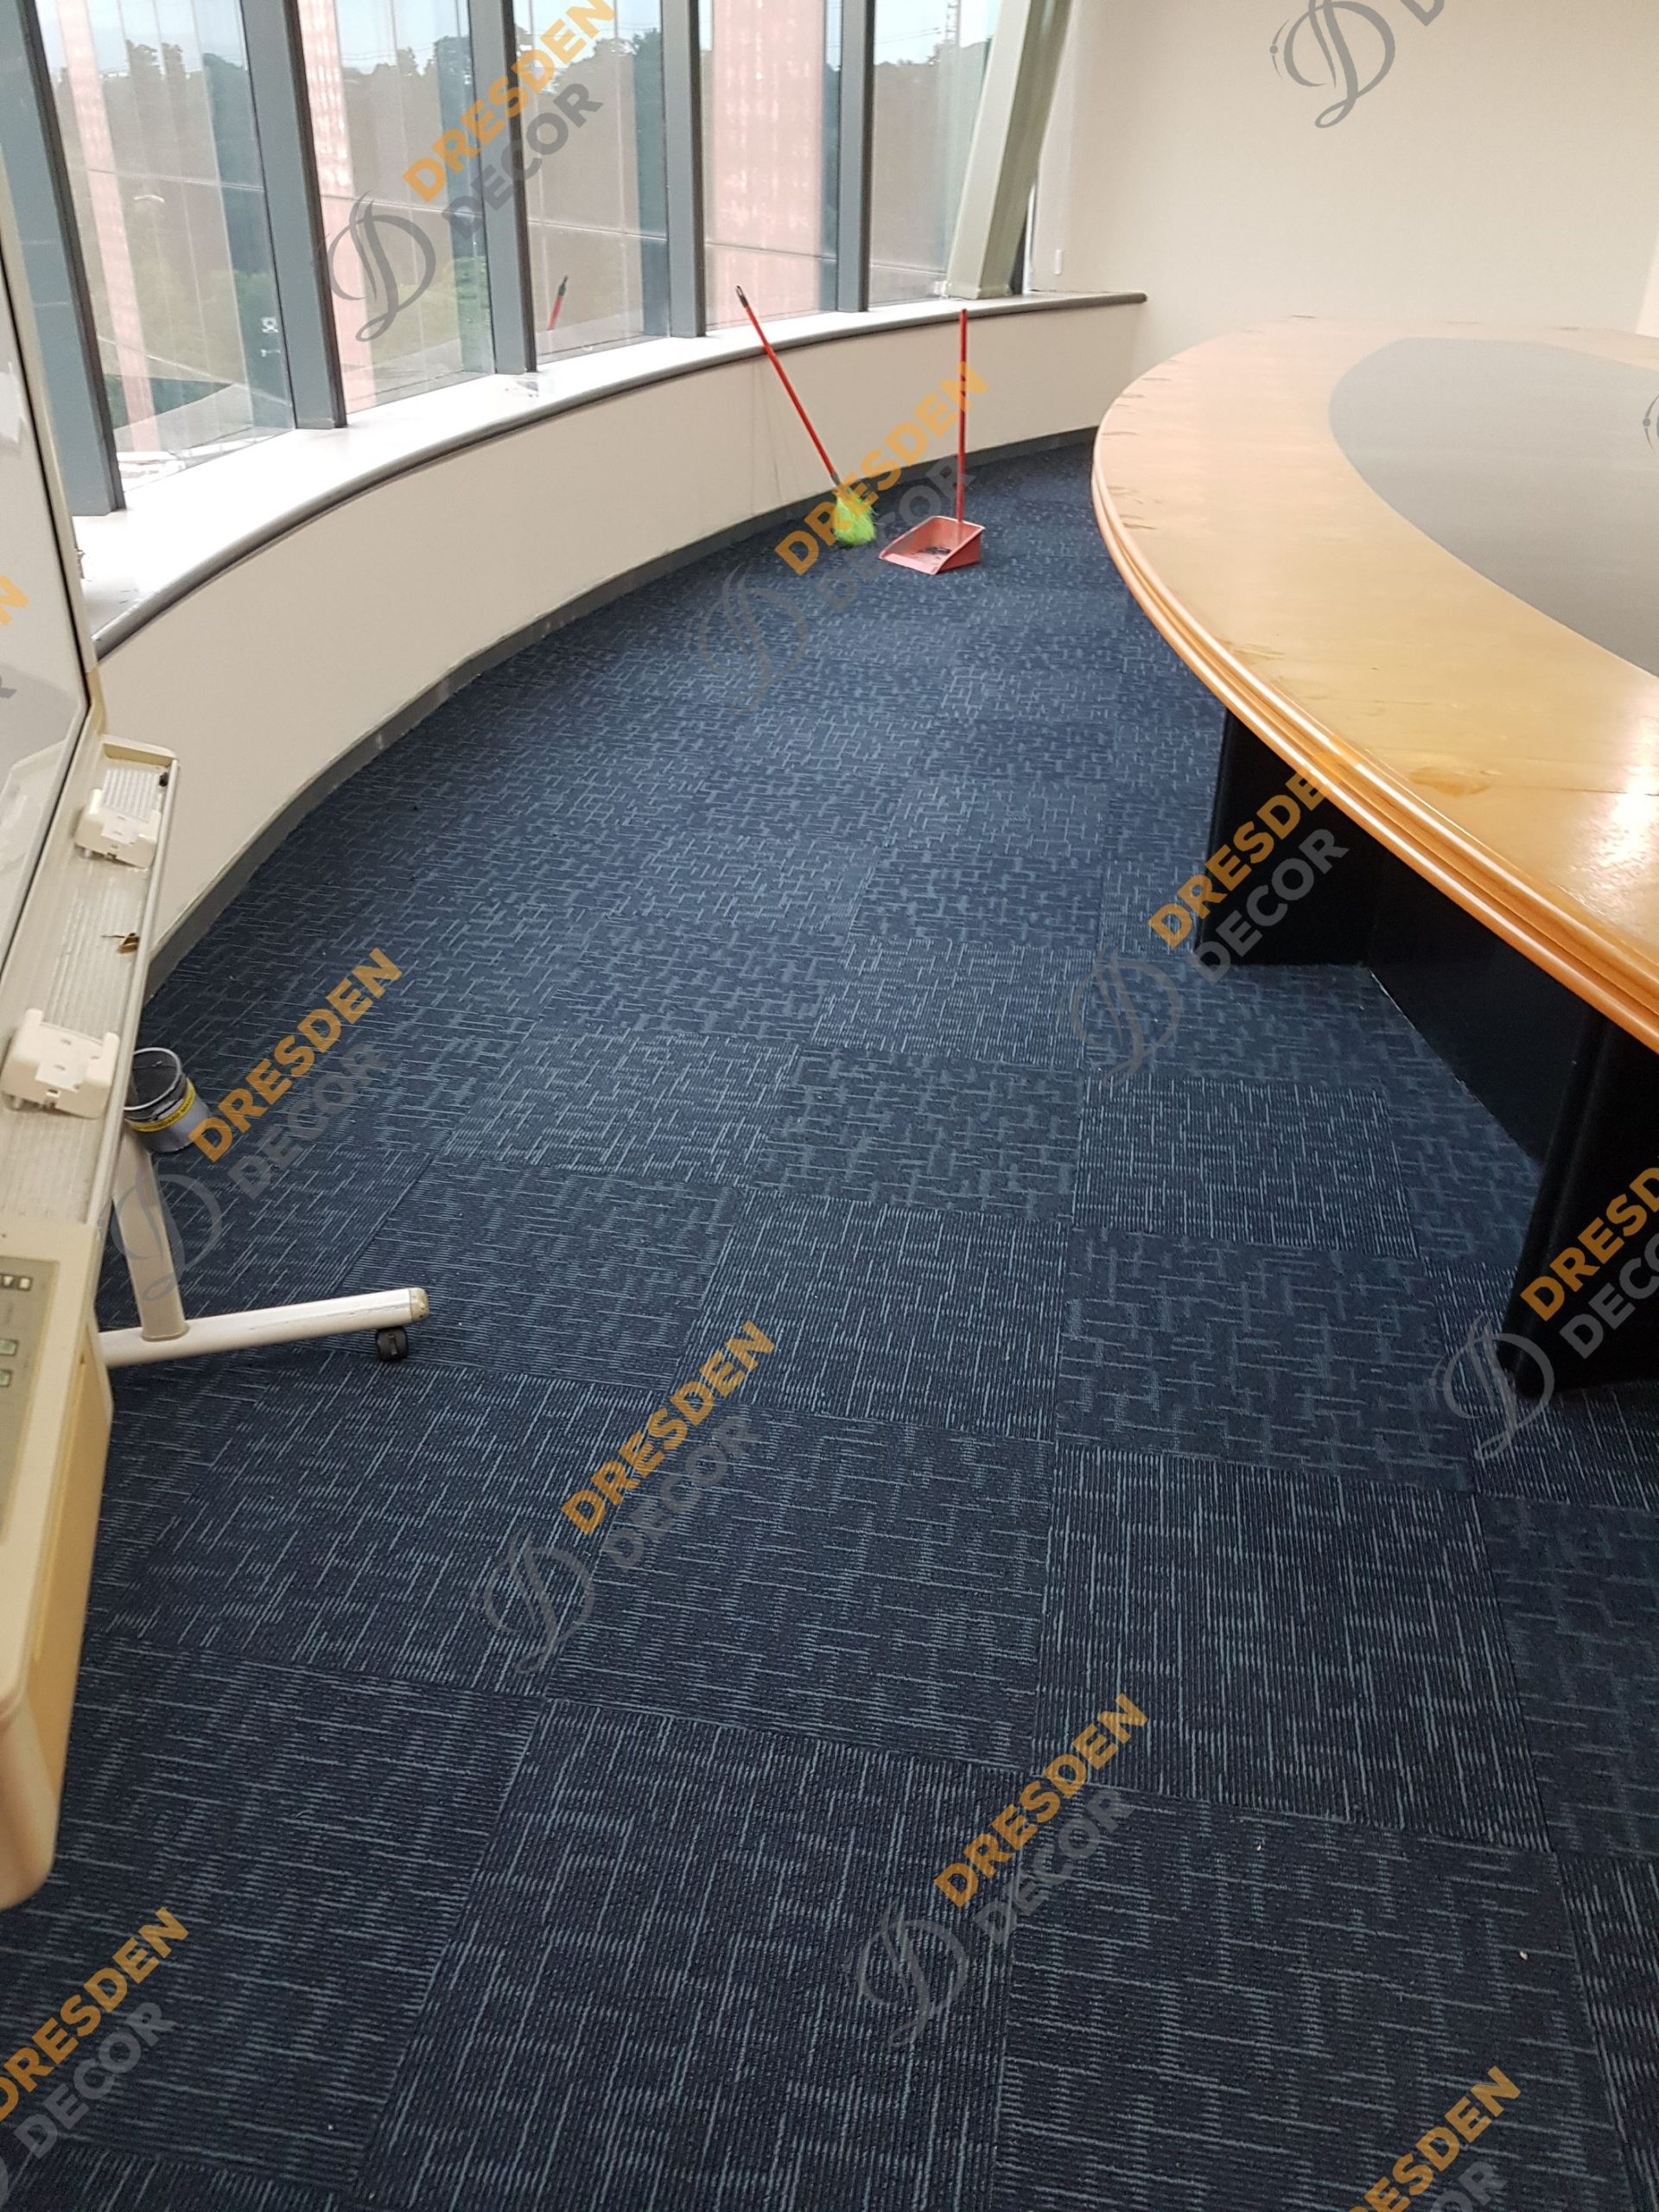 DRB HICOM Glemarie – PP Carpet Tiles